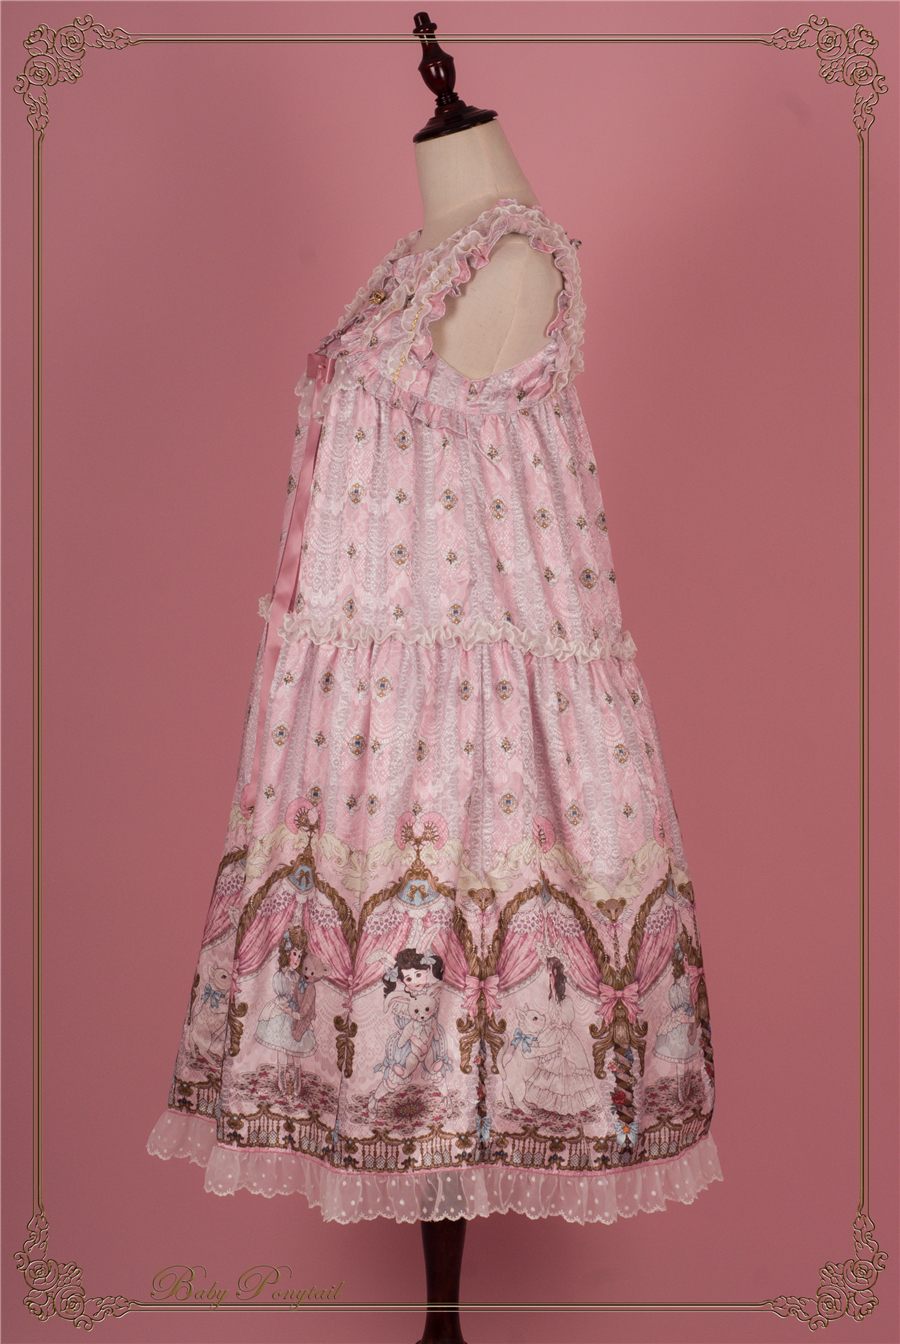 BabyPonytail_Stock Photo_My Favorite Companion_JSK Baby Doll Pink_06.jpg